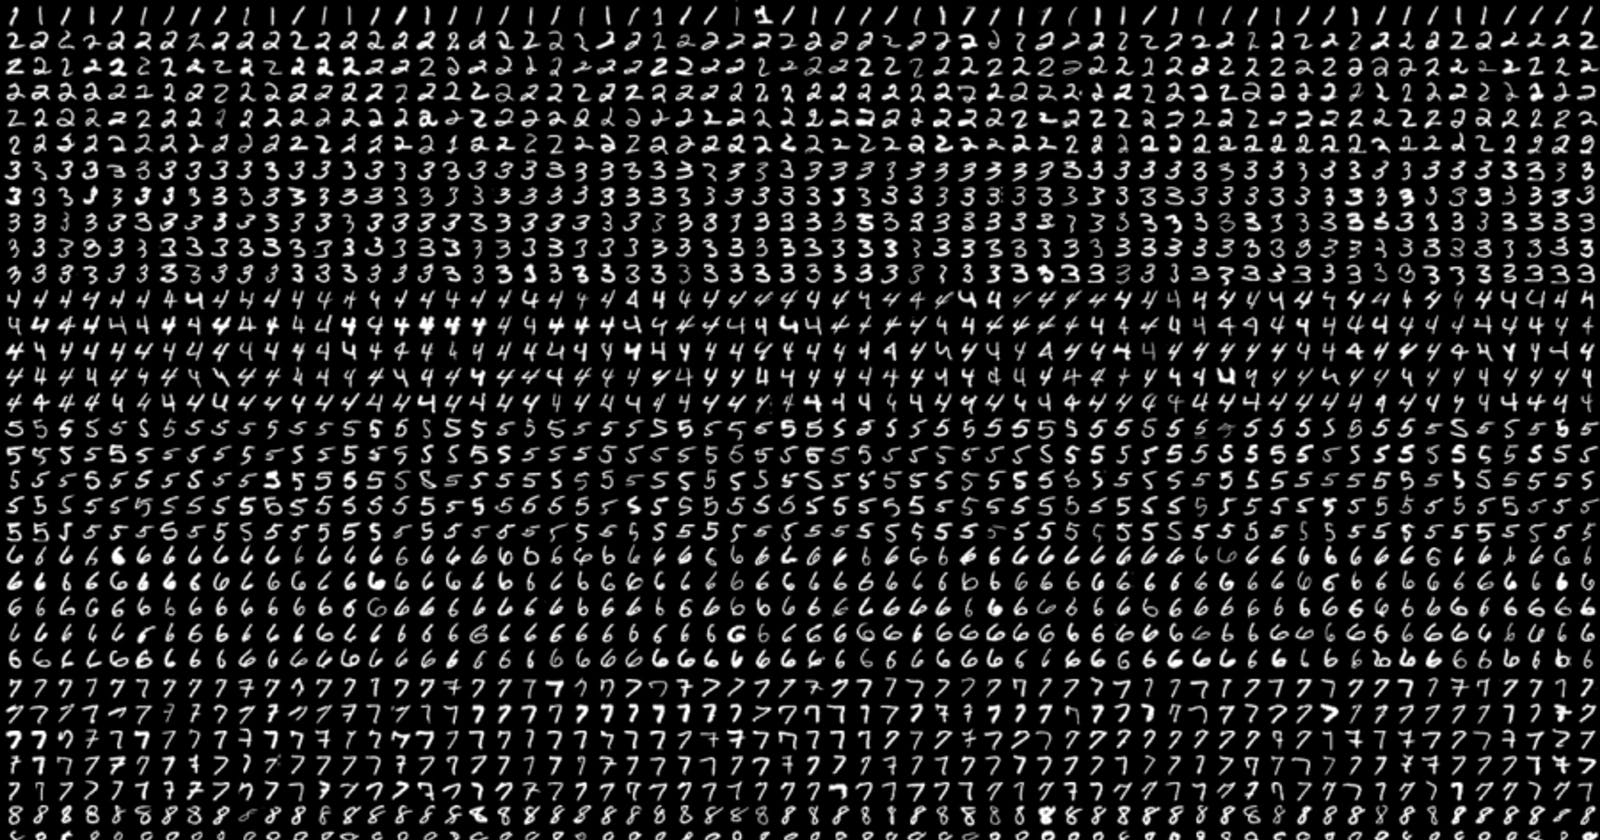 Neural Network For Handwritten Digits Classification using TensorFlow and keras